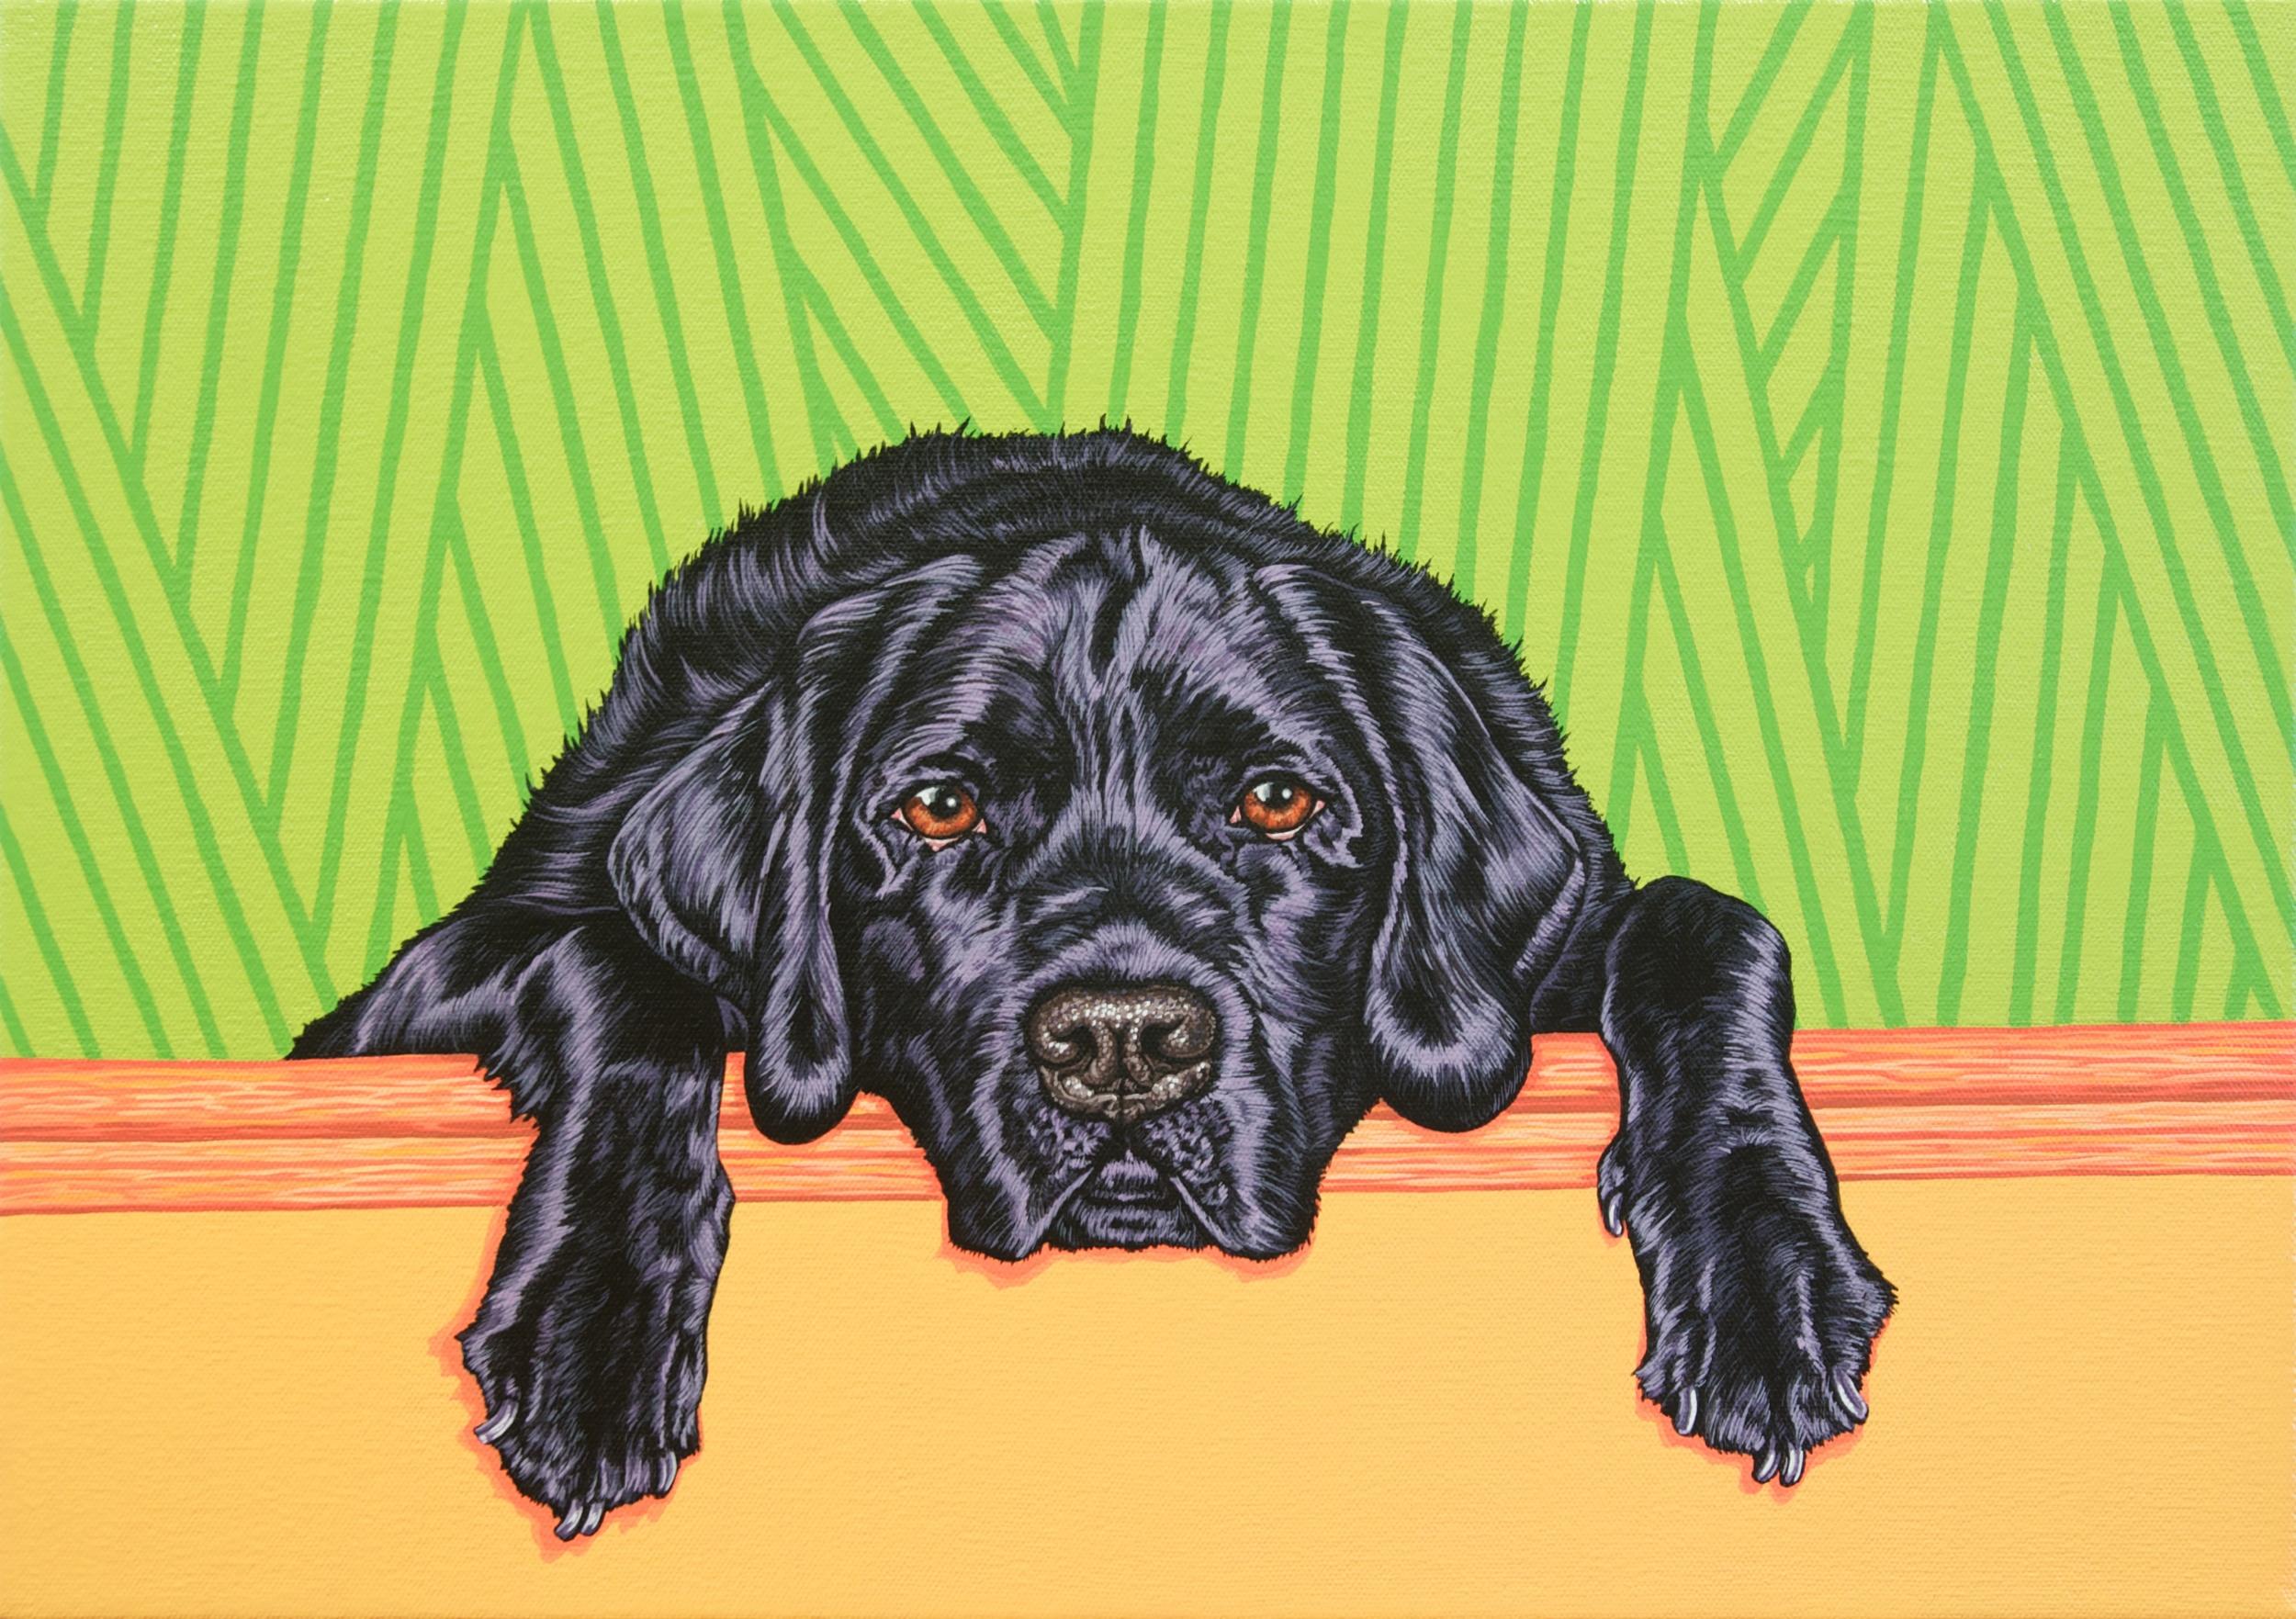 """Brady"", latex enamel on canvas, 14""x 20"", 2014"